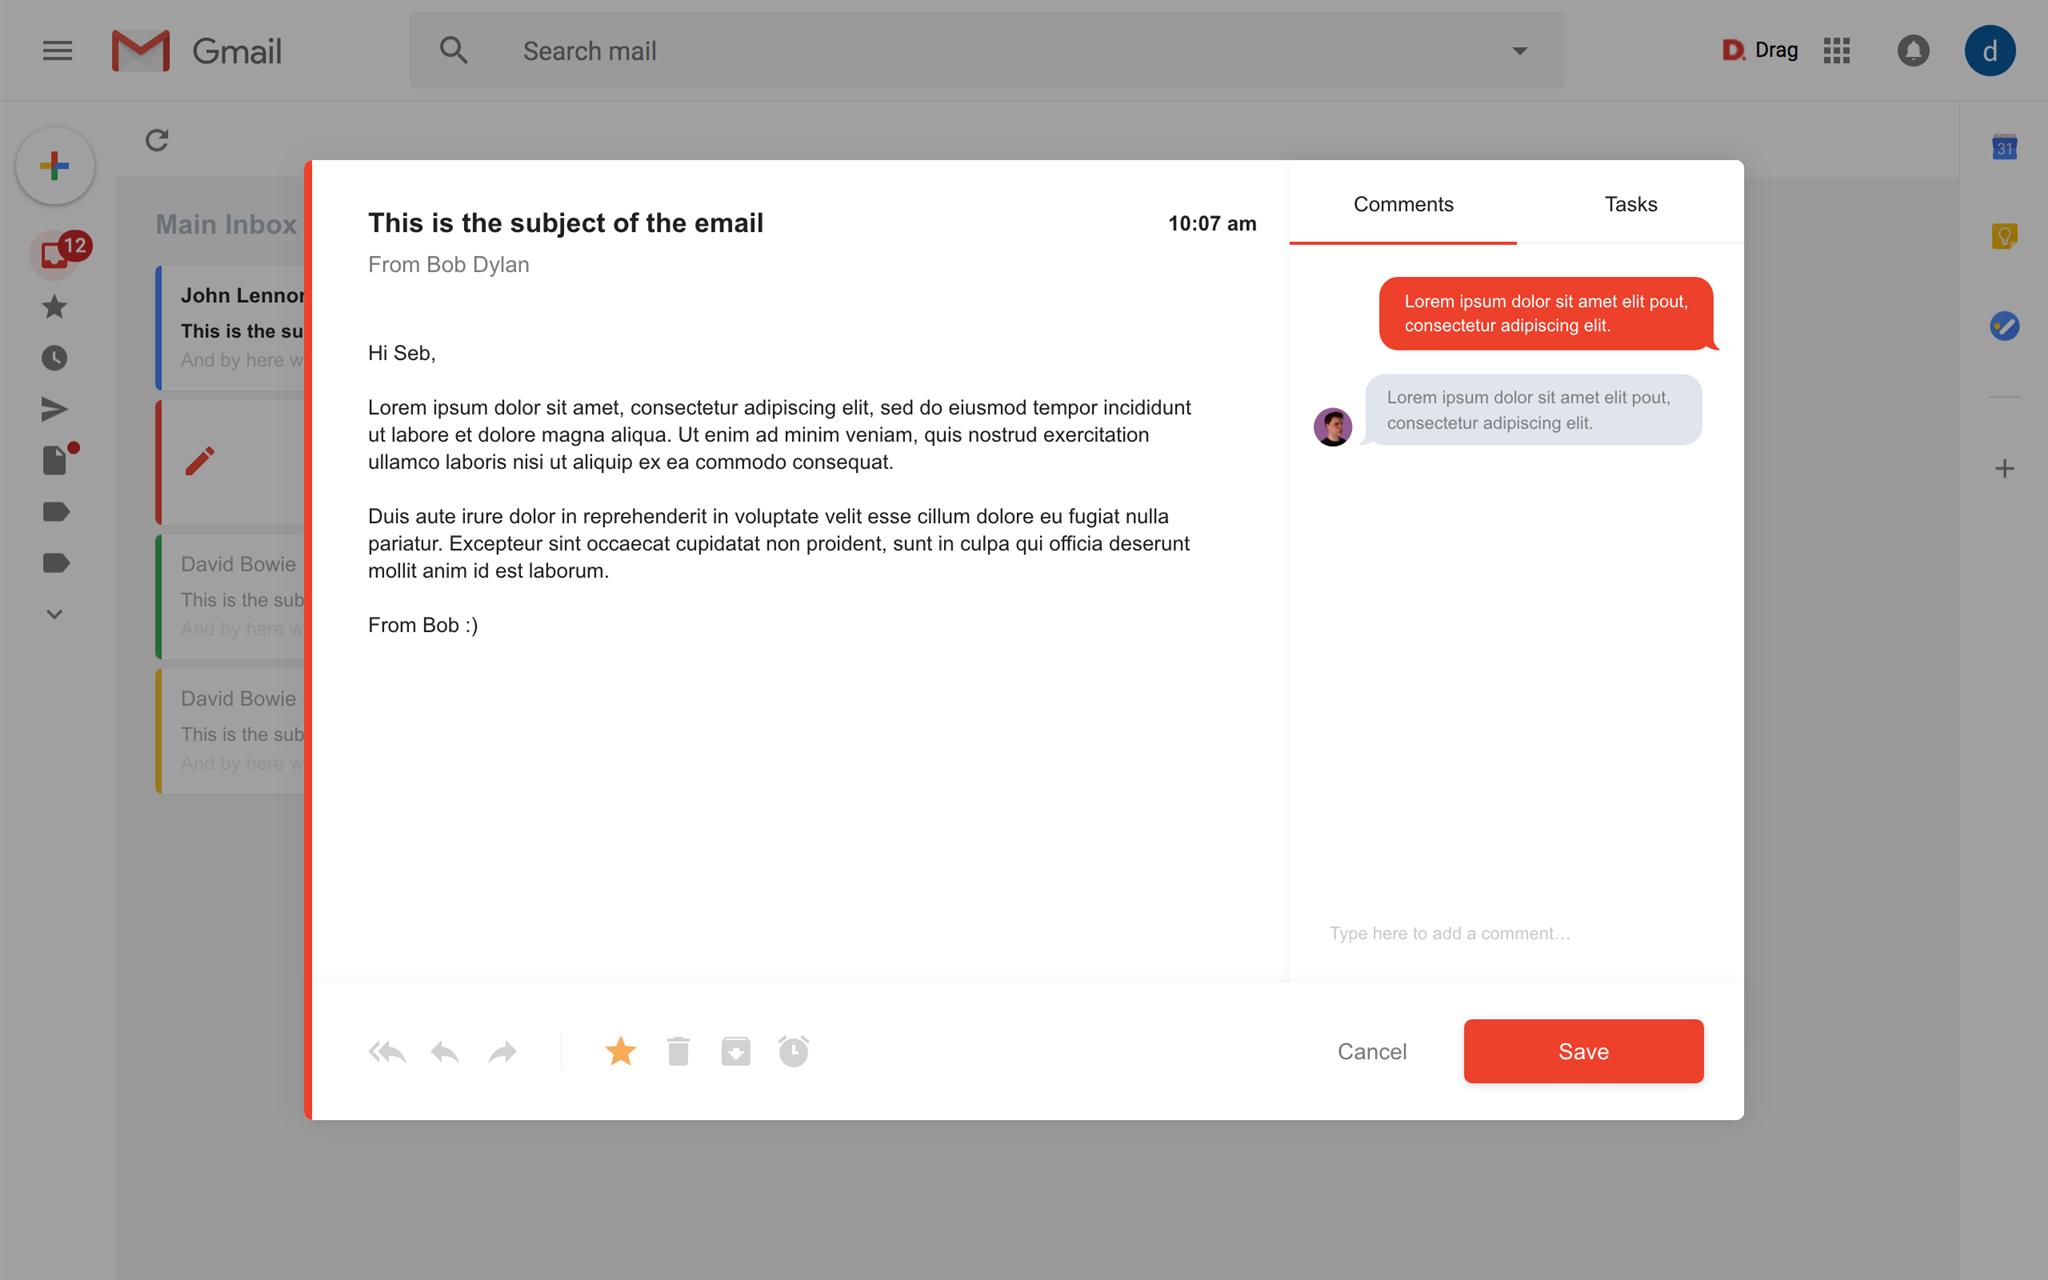 drag app shared inbox